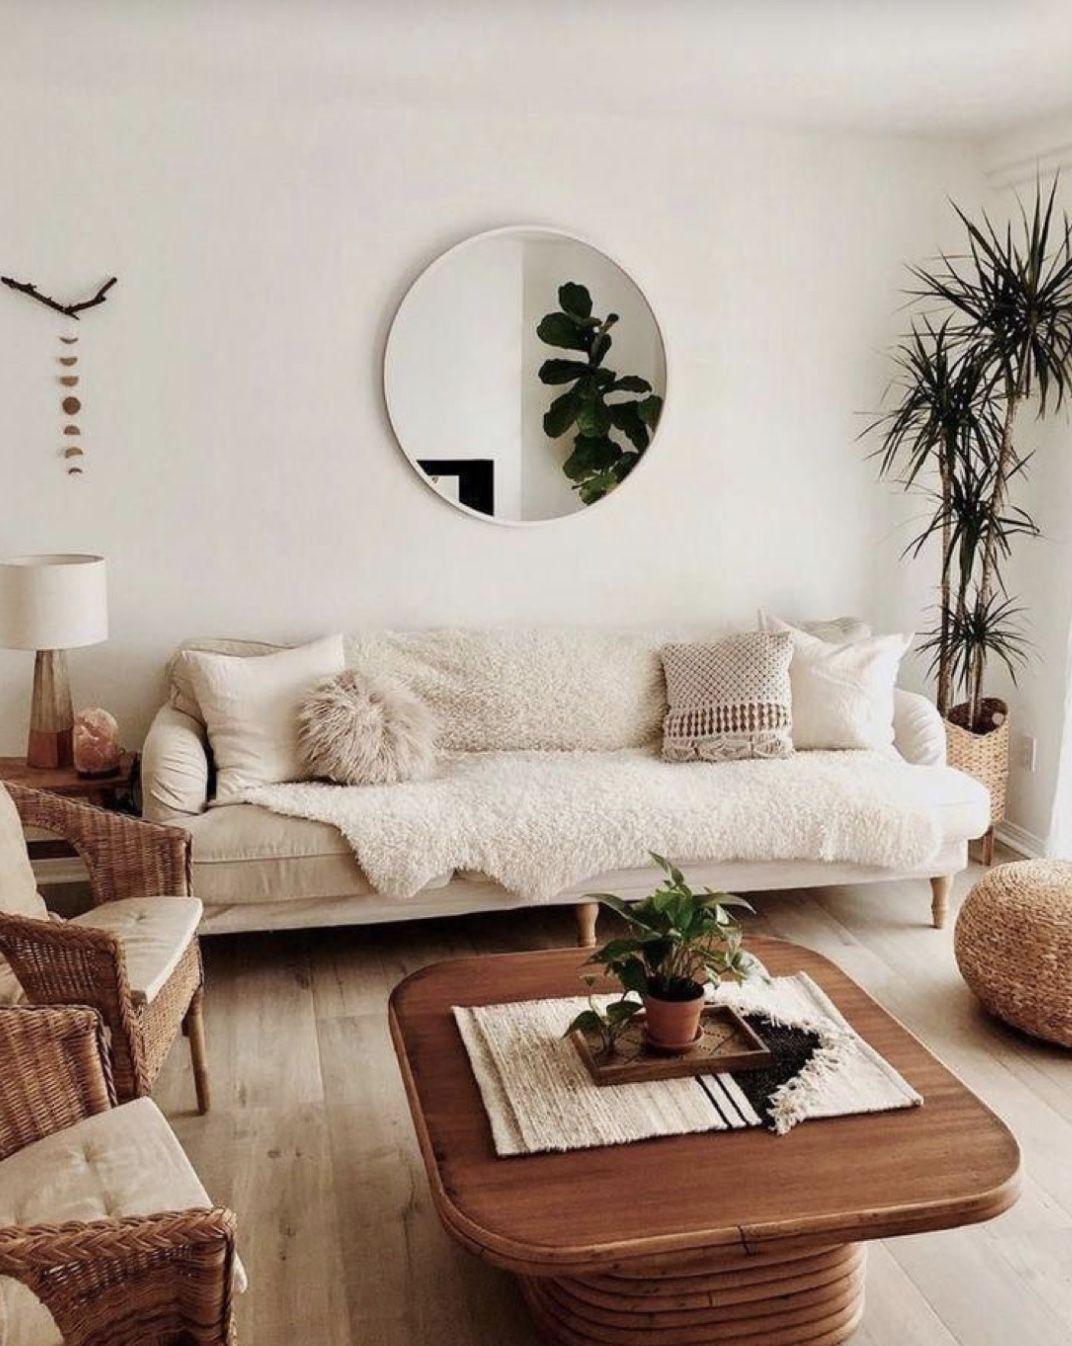 Rhein Accent Mirror Living room decor apartment, Bright